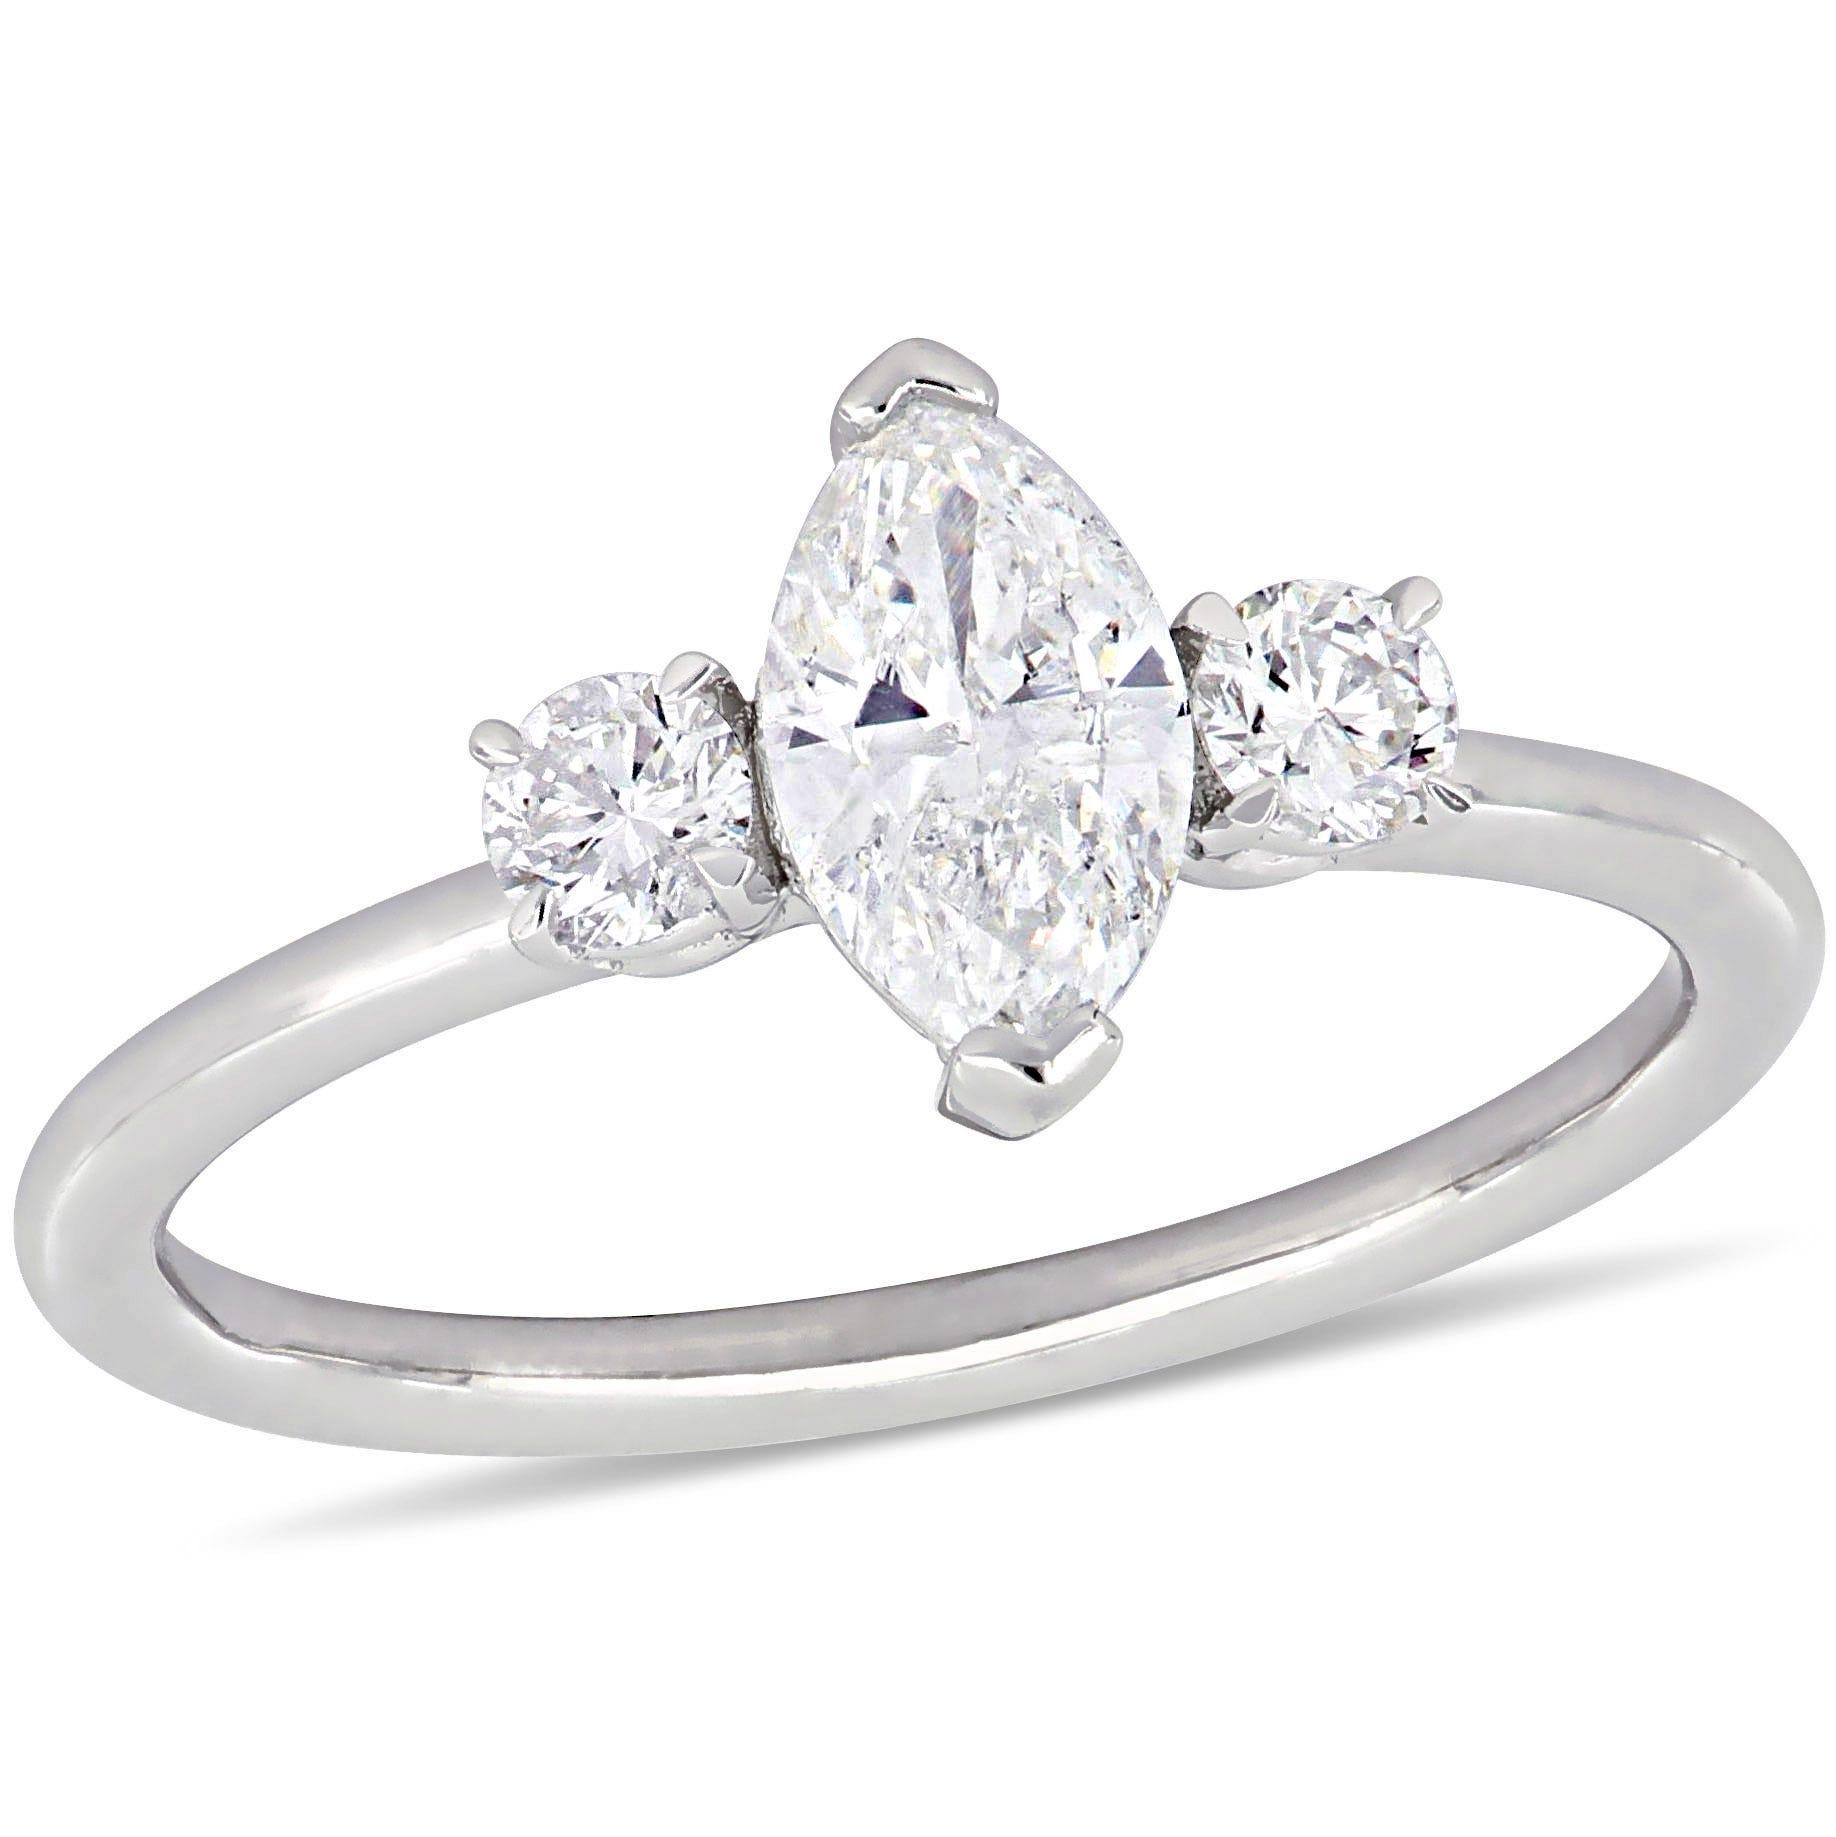 Three-Stone Marquise & Round 1ctw. Diamond Engagement Ring in 14k White Gold